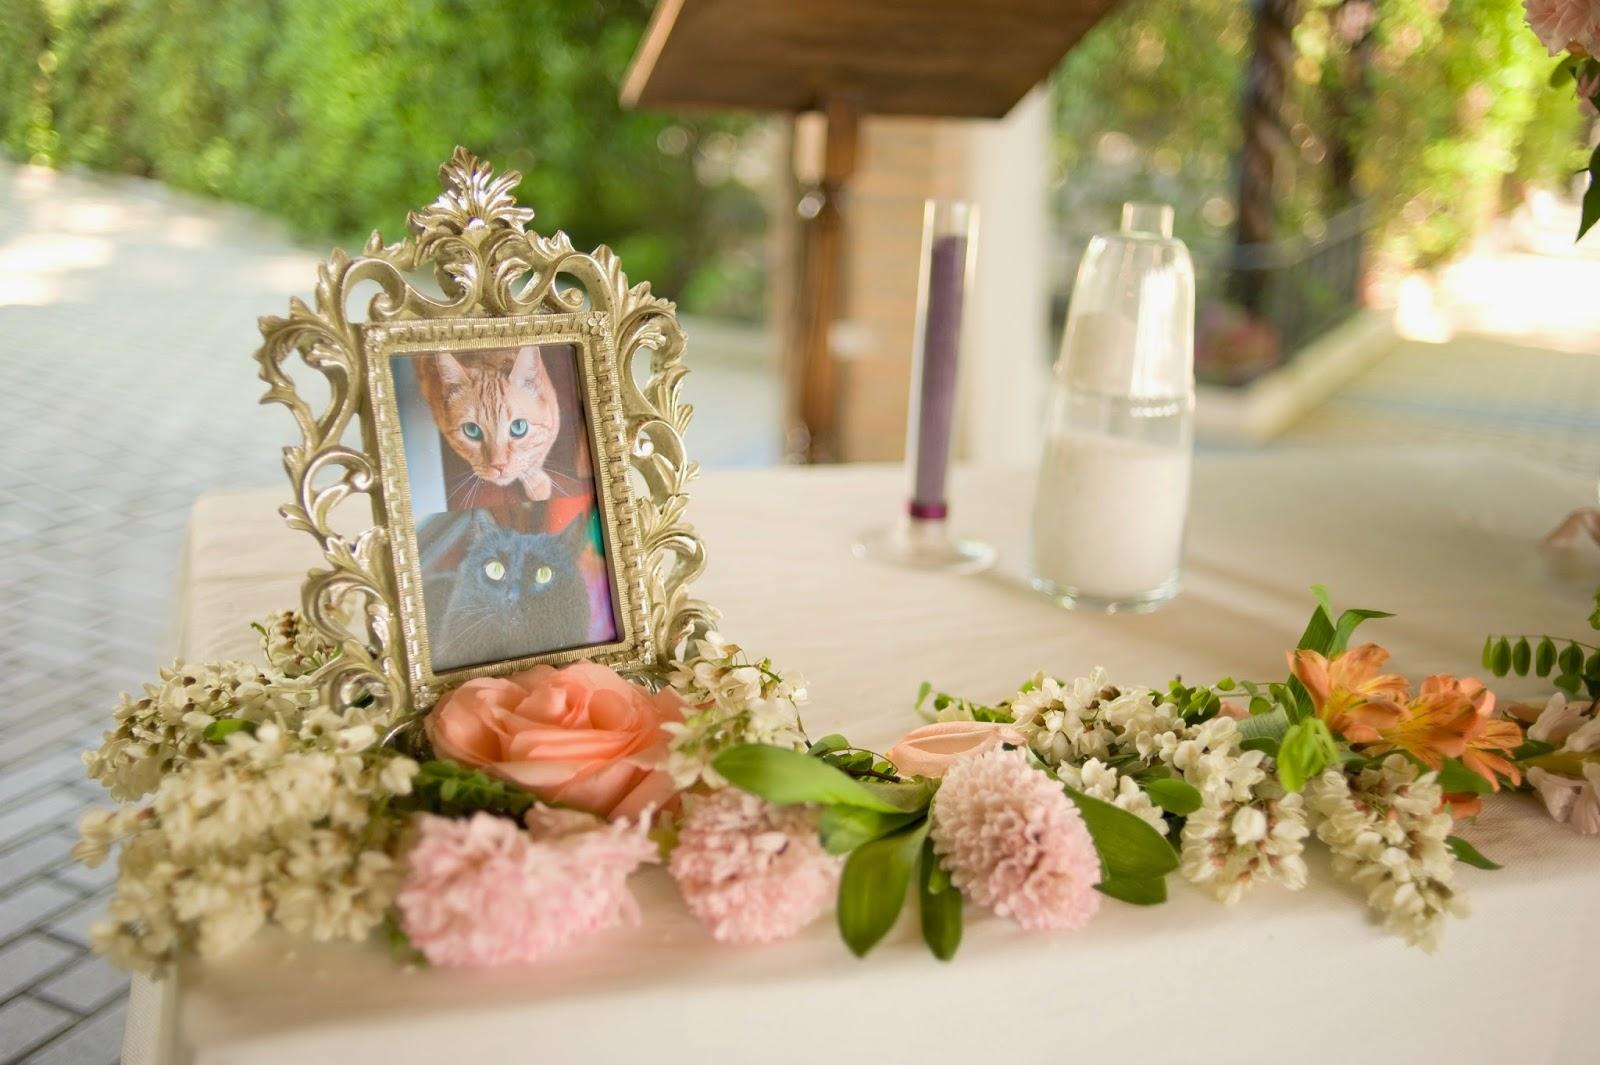 Decoracion jardin boda civil for Boda decoracion